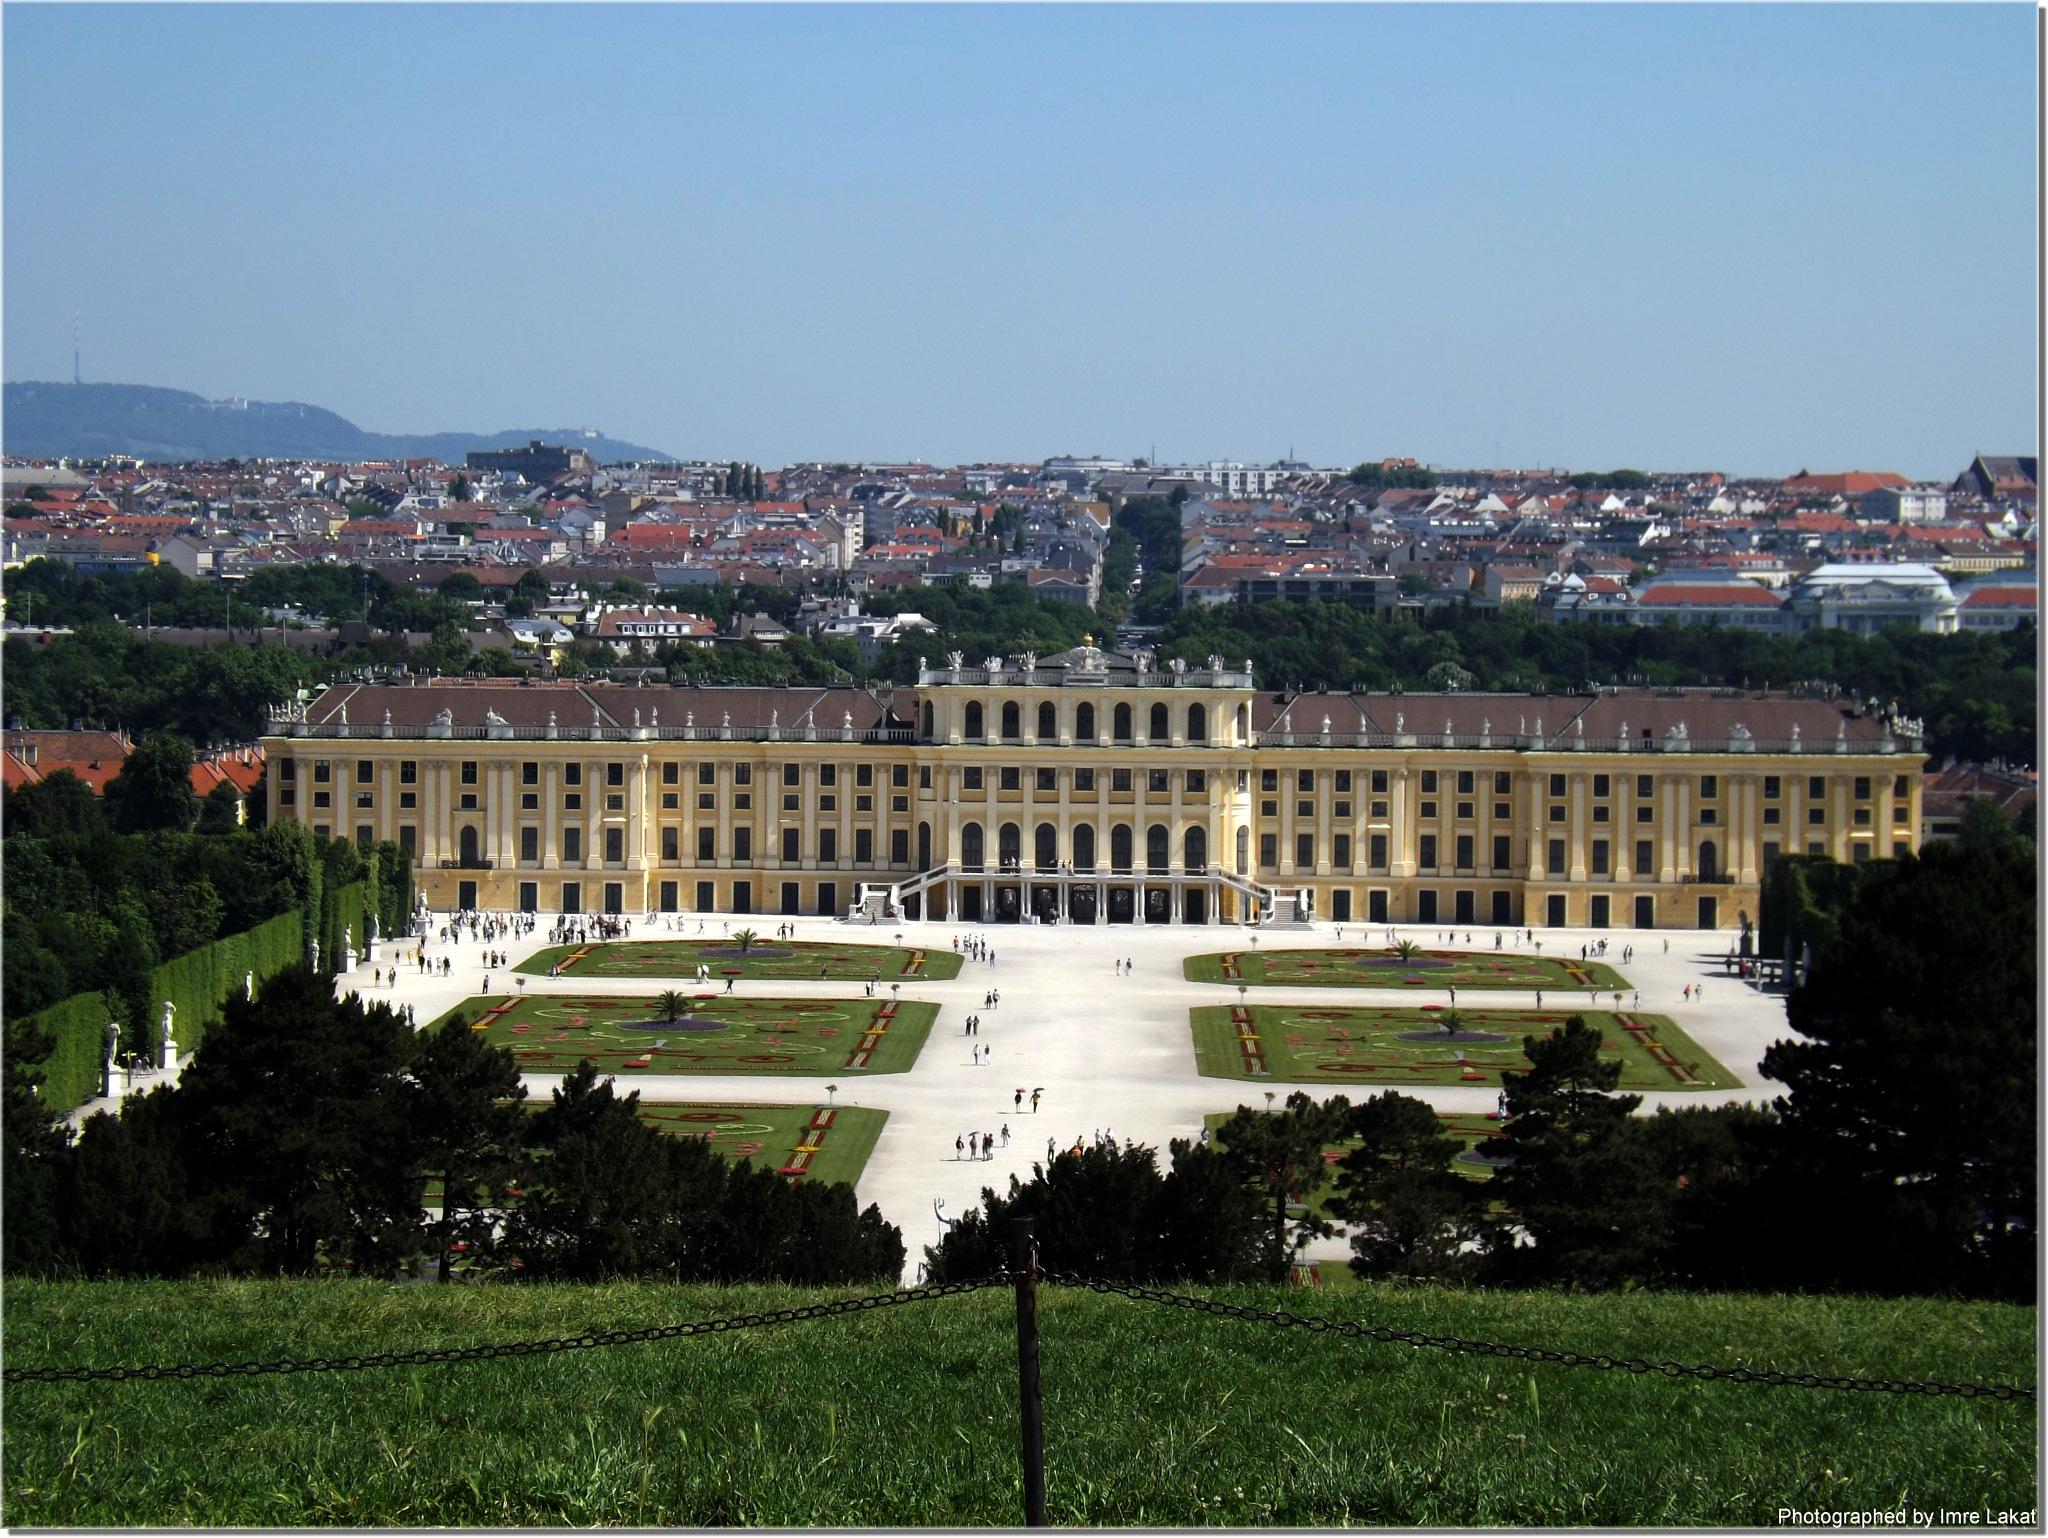 Schönbrunn Palace am Vienna by Imre Lakat